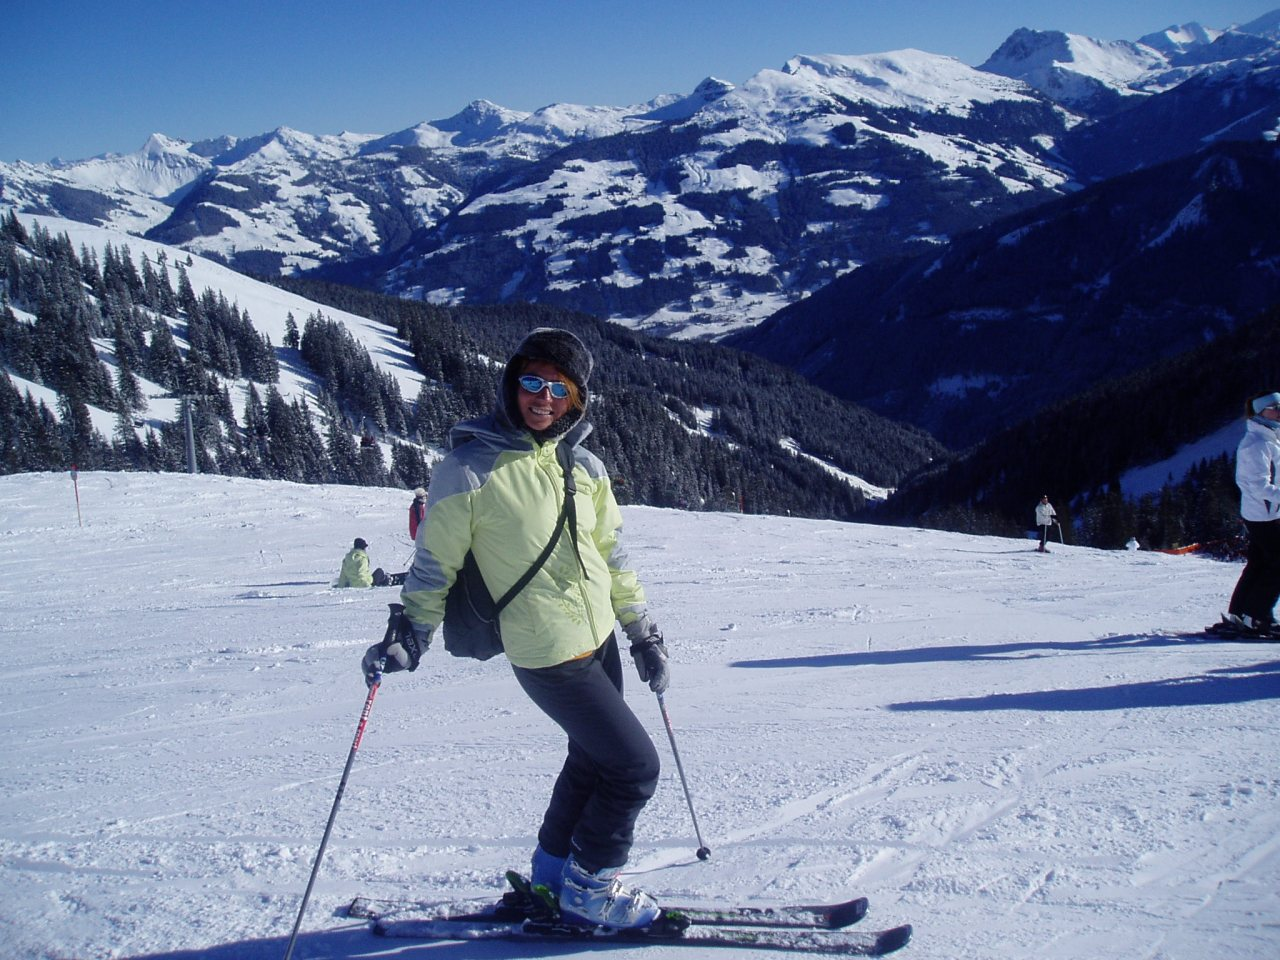 Best ski resorts in Europe: Kitzhbuhel